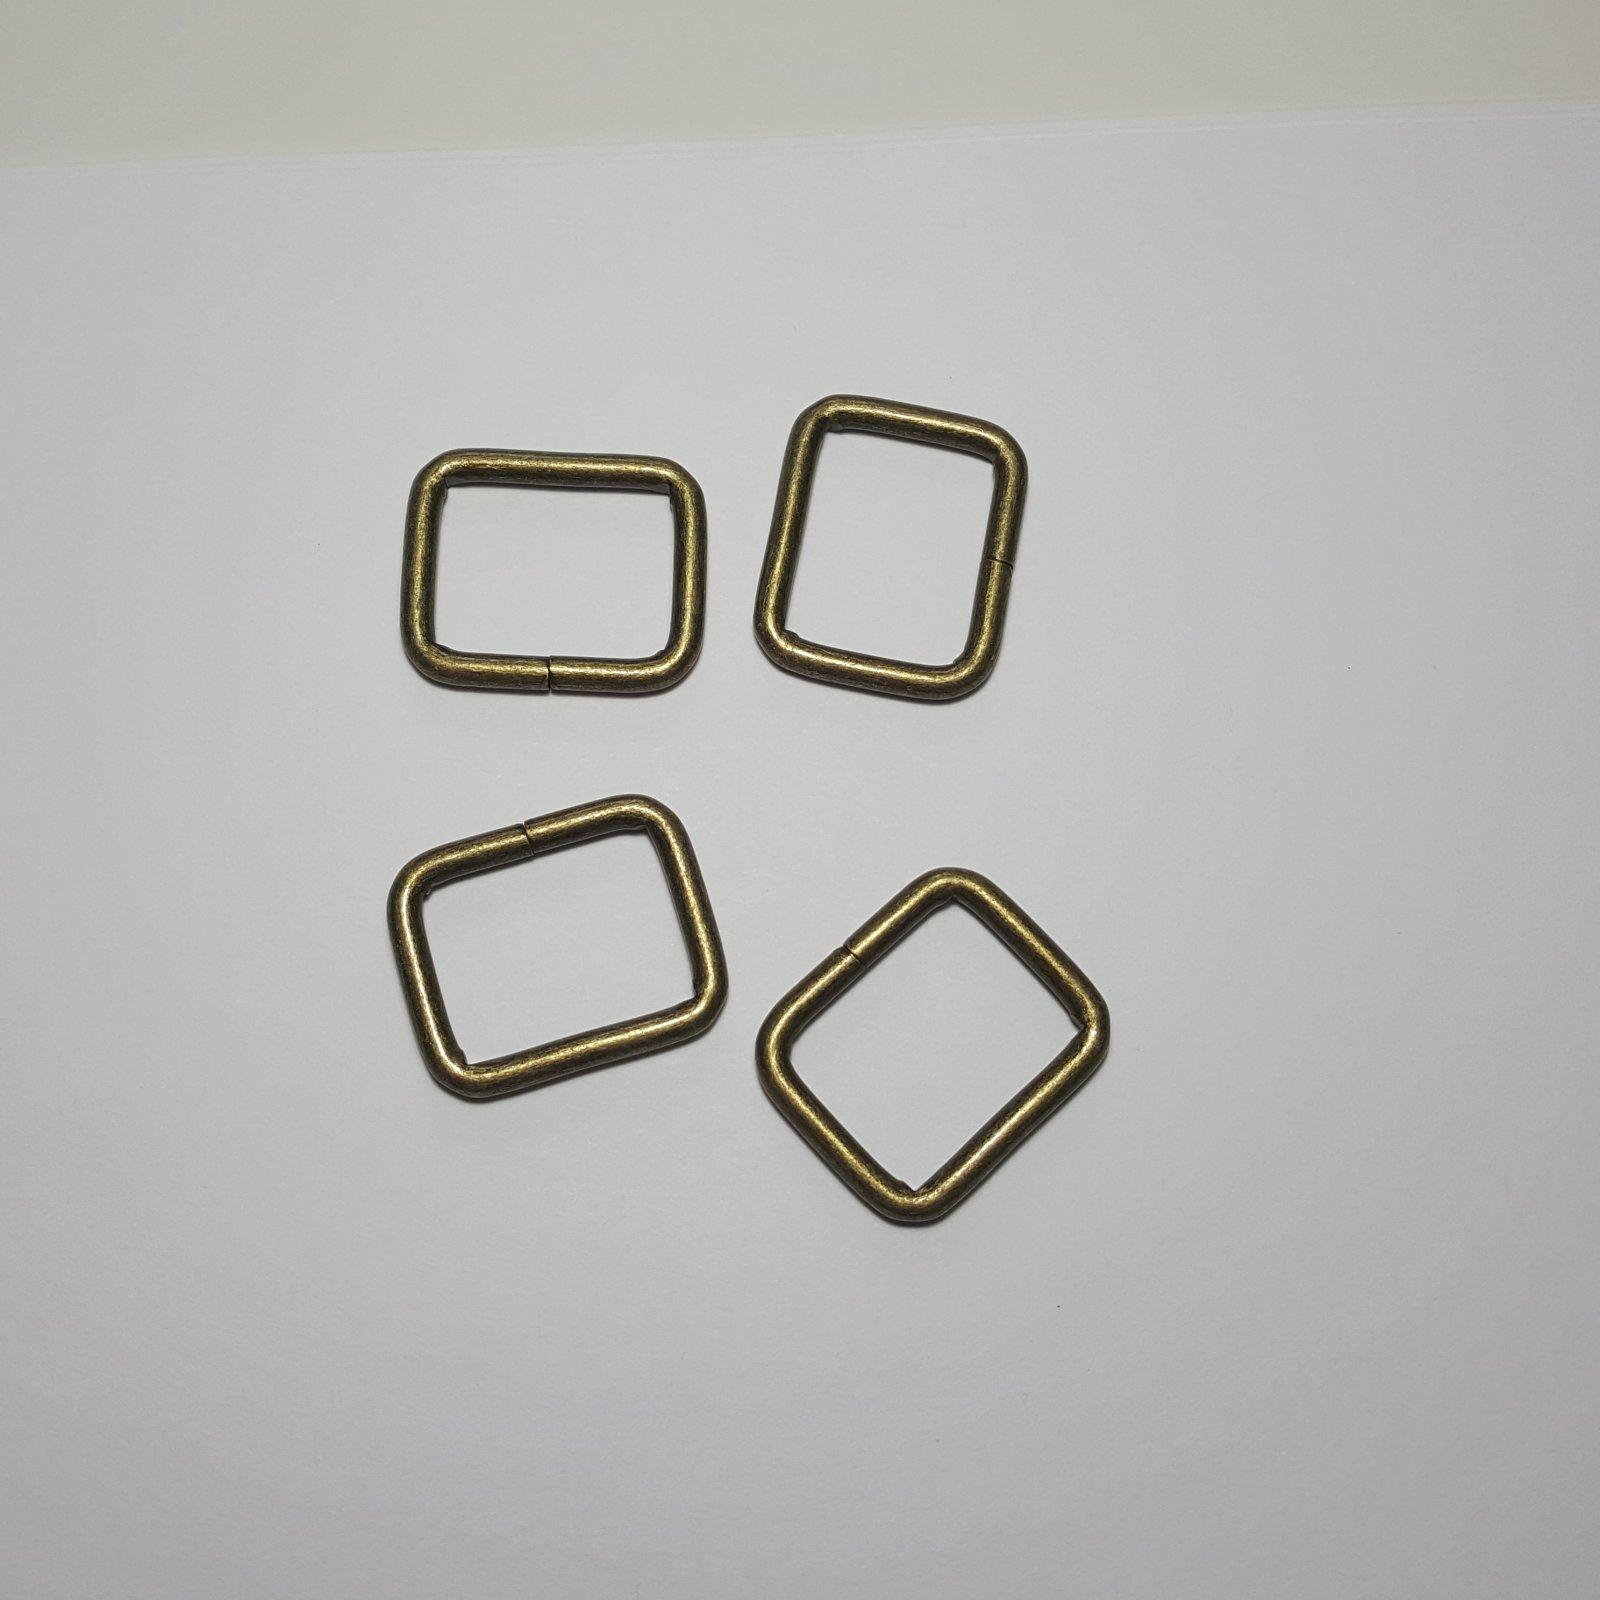 1- 4 Rectangle Rings - Brass